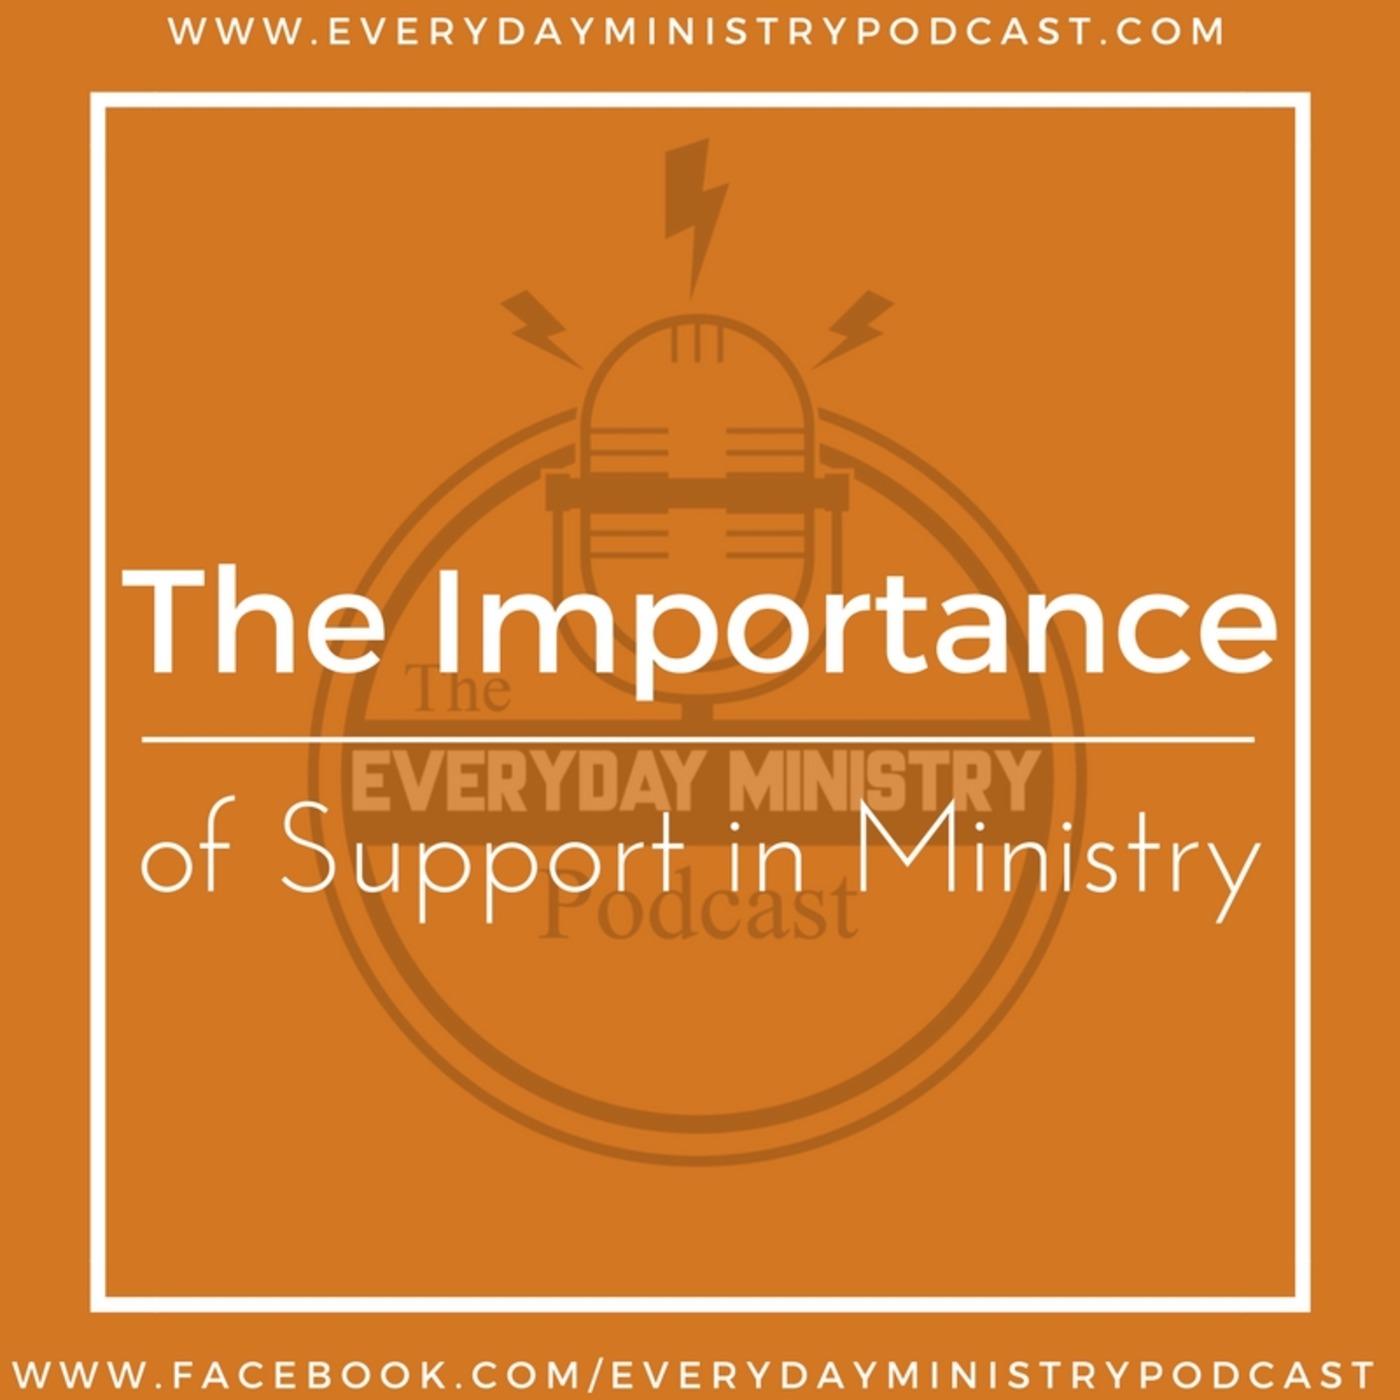 Everyday Ministry Podcast